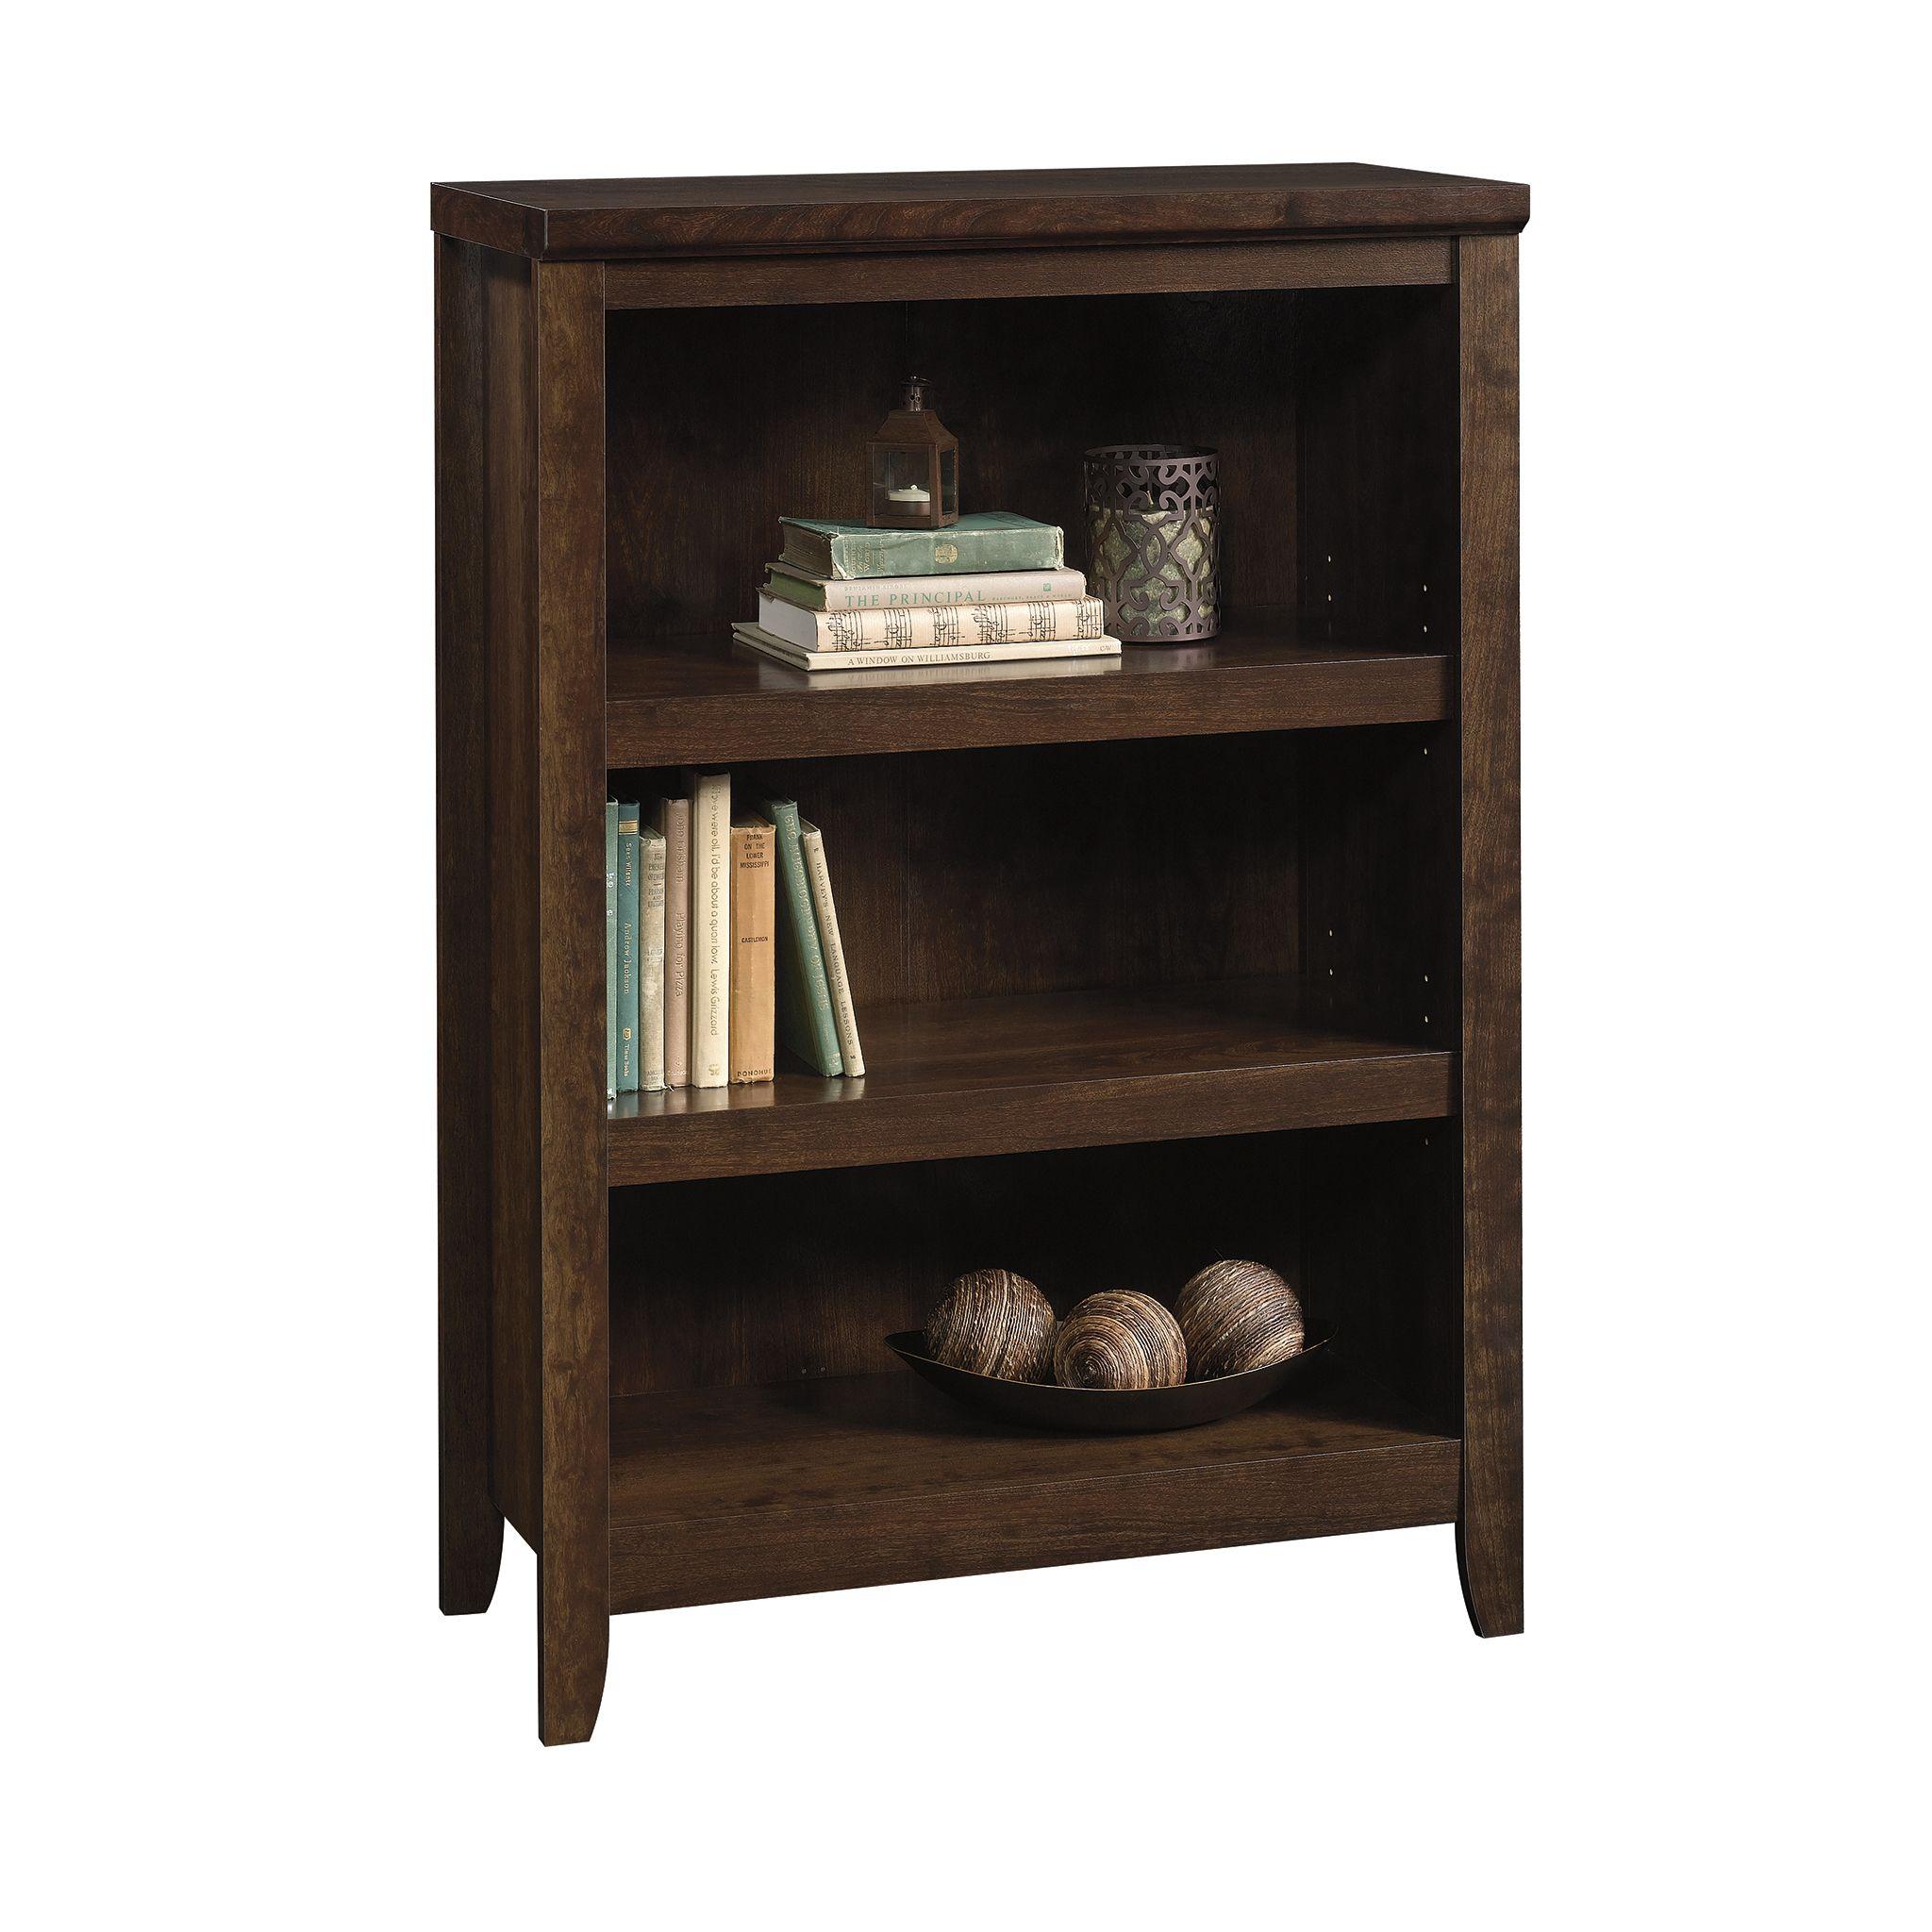 Gift The Bookworm A 3 Shelf Bookcase 3 Shelf Bookcase Bookcase Shelves